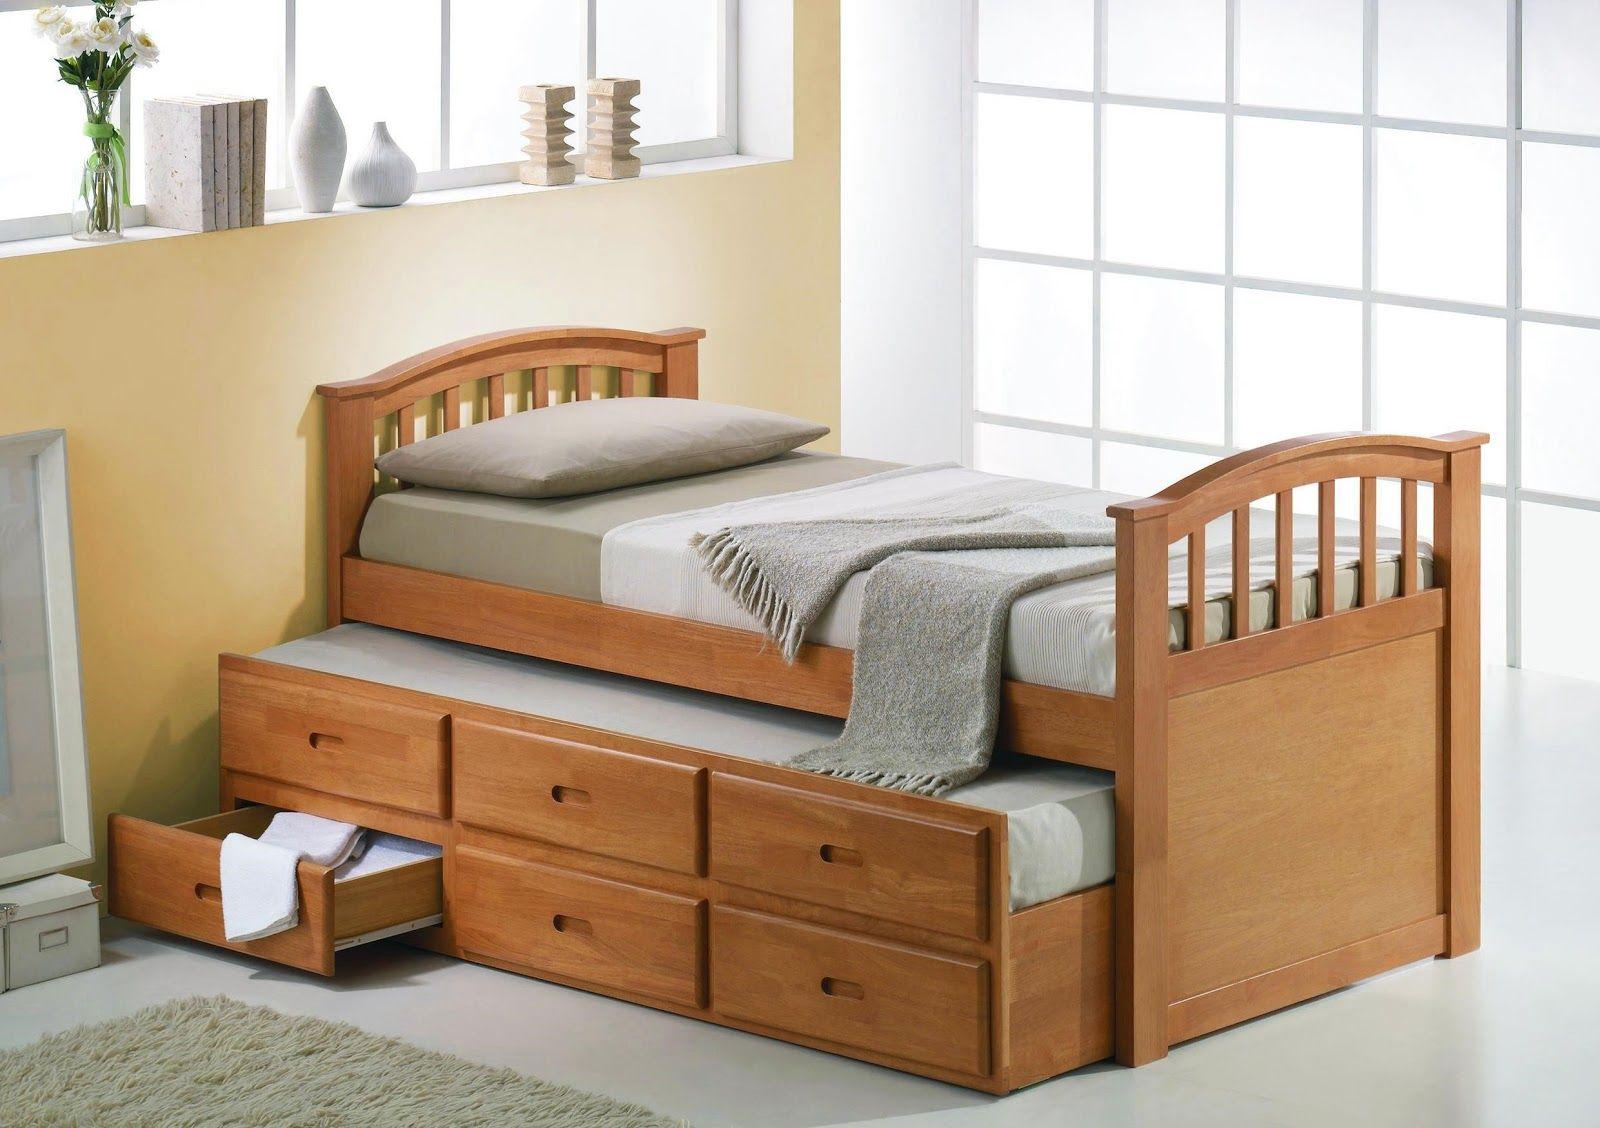 Single-bedroom-suite-gorgeous-wooden-single-bed-designs-storage ...